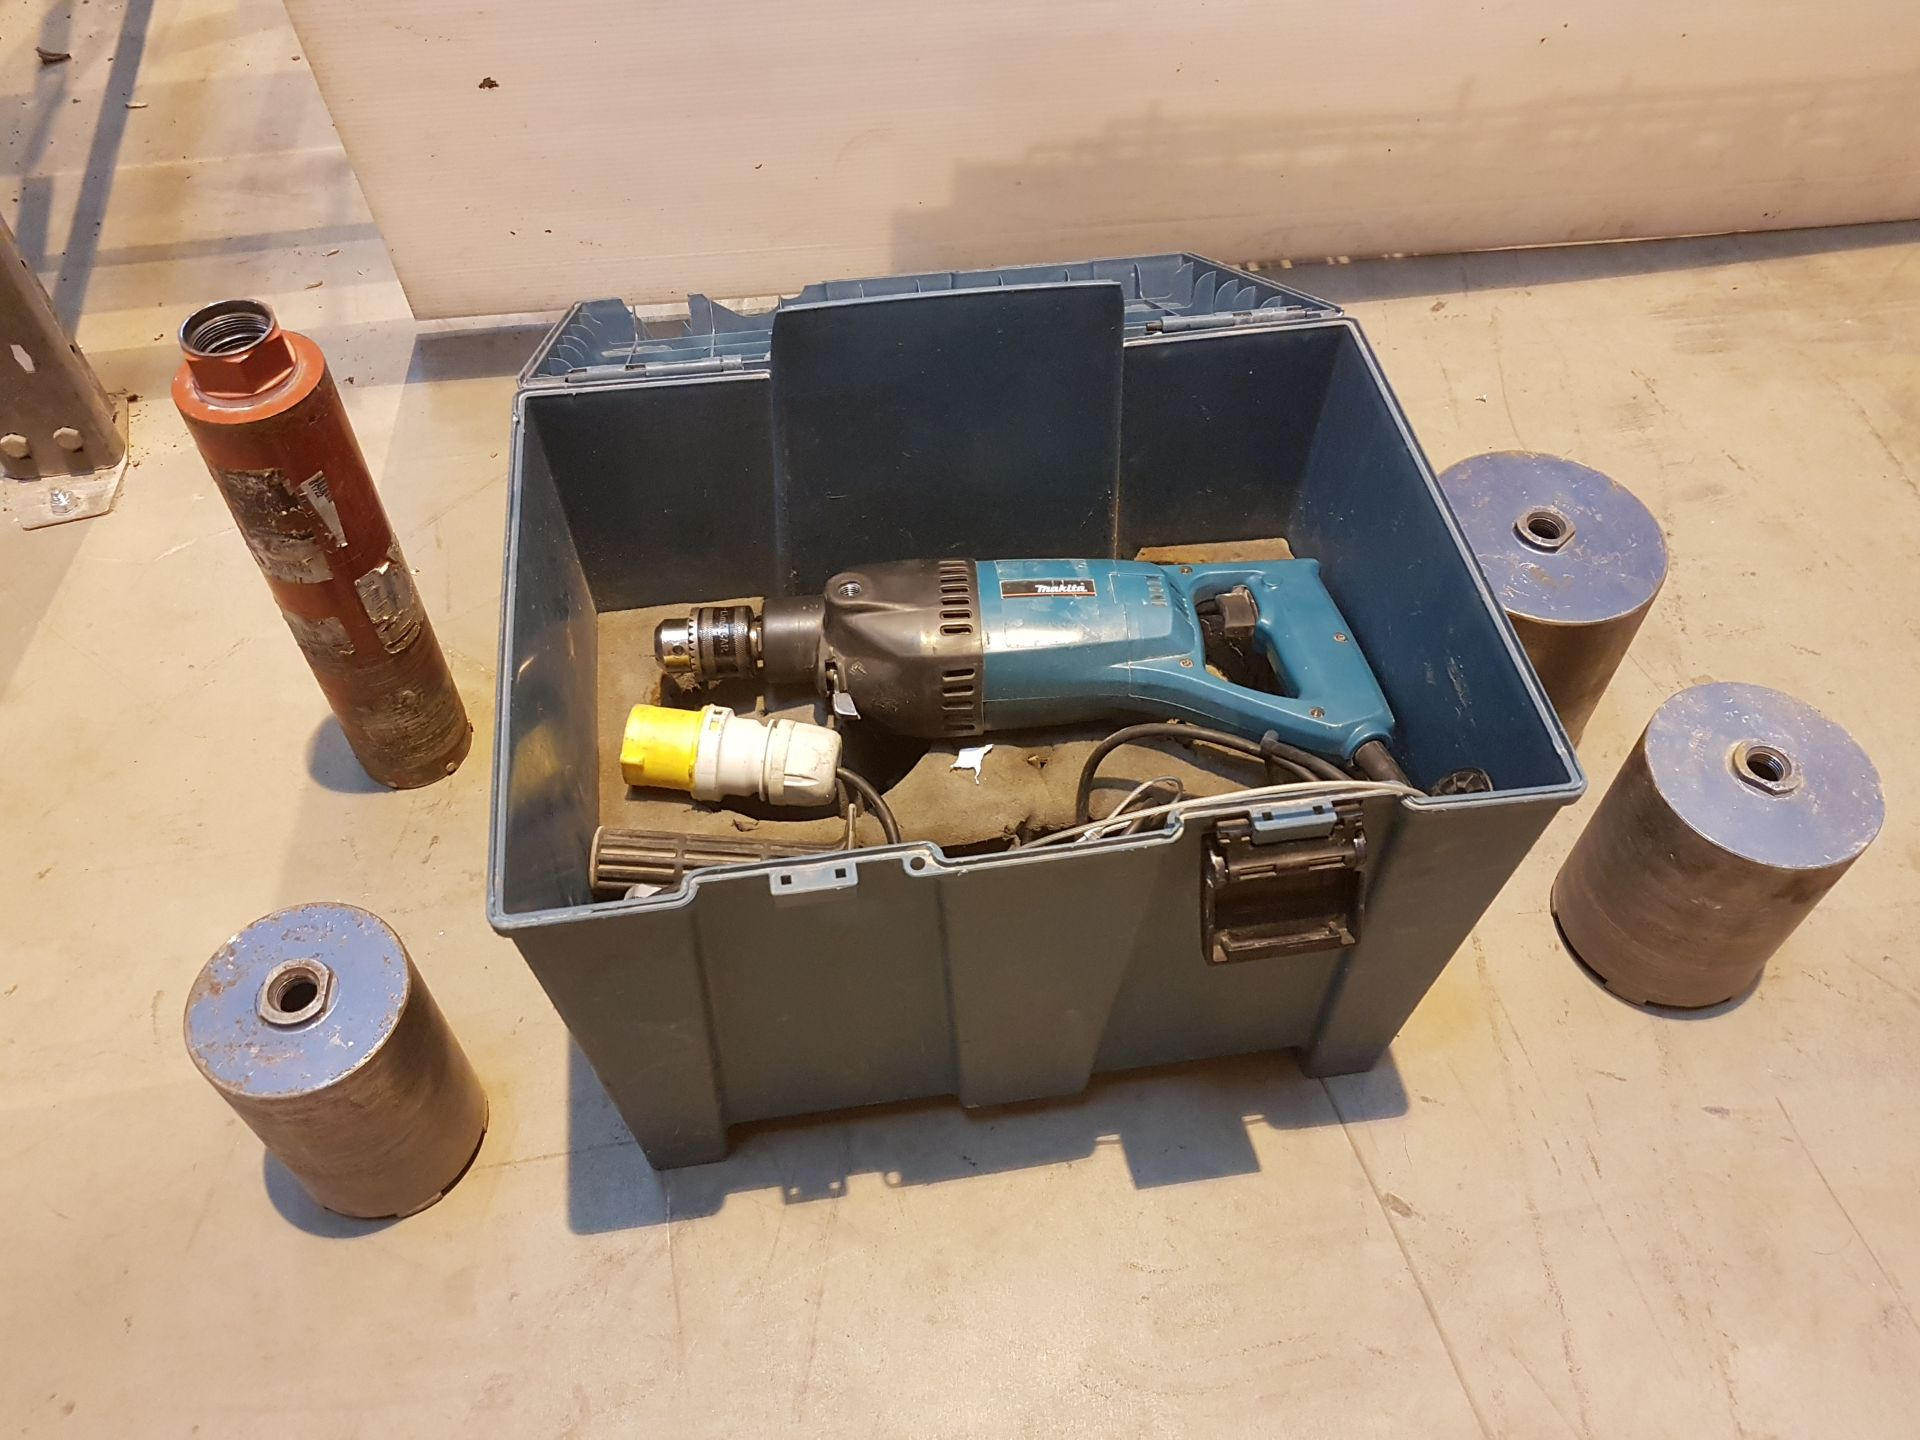 Lot 21 - Makita L/DUTY DRY 110v DIAMOND DRILL - 110V MAKT0575, working